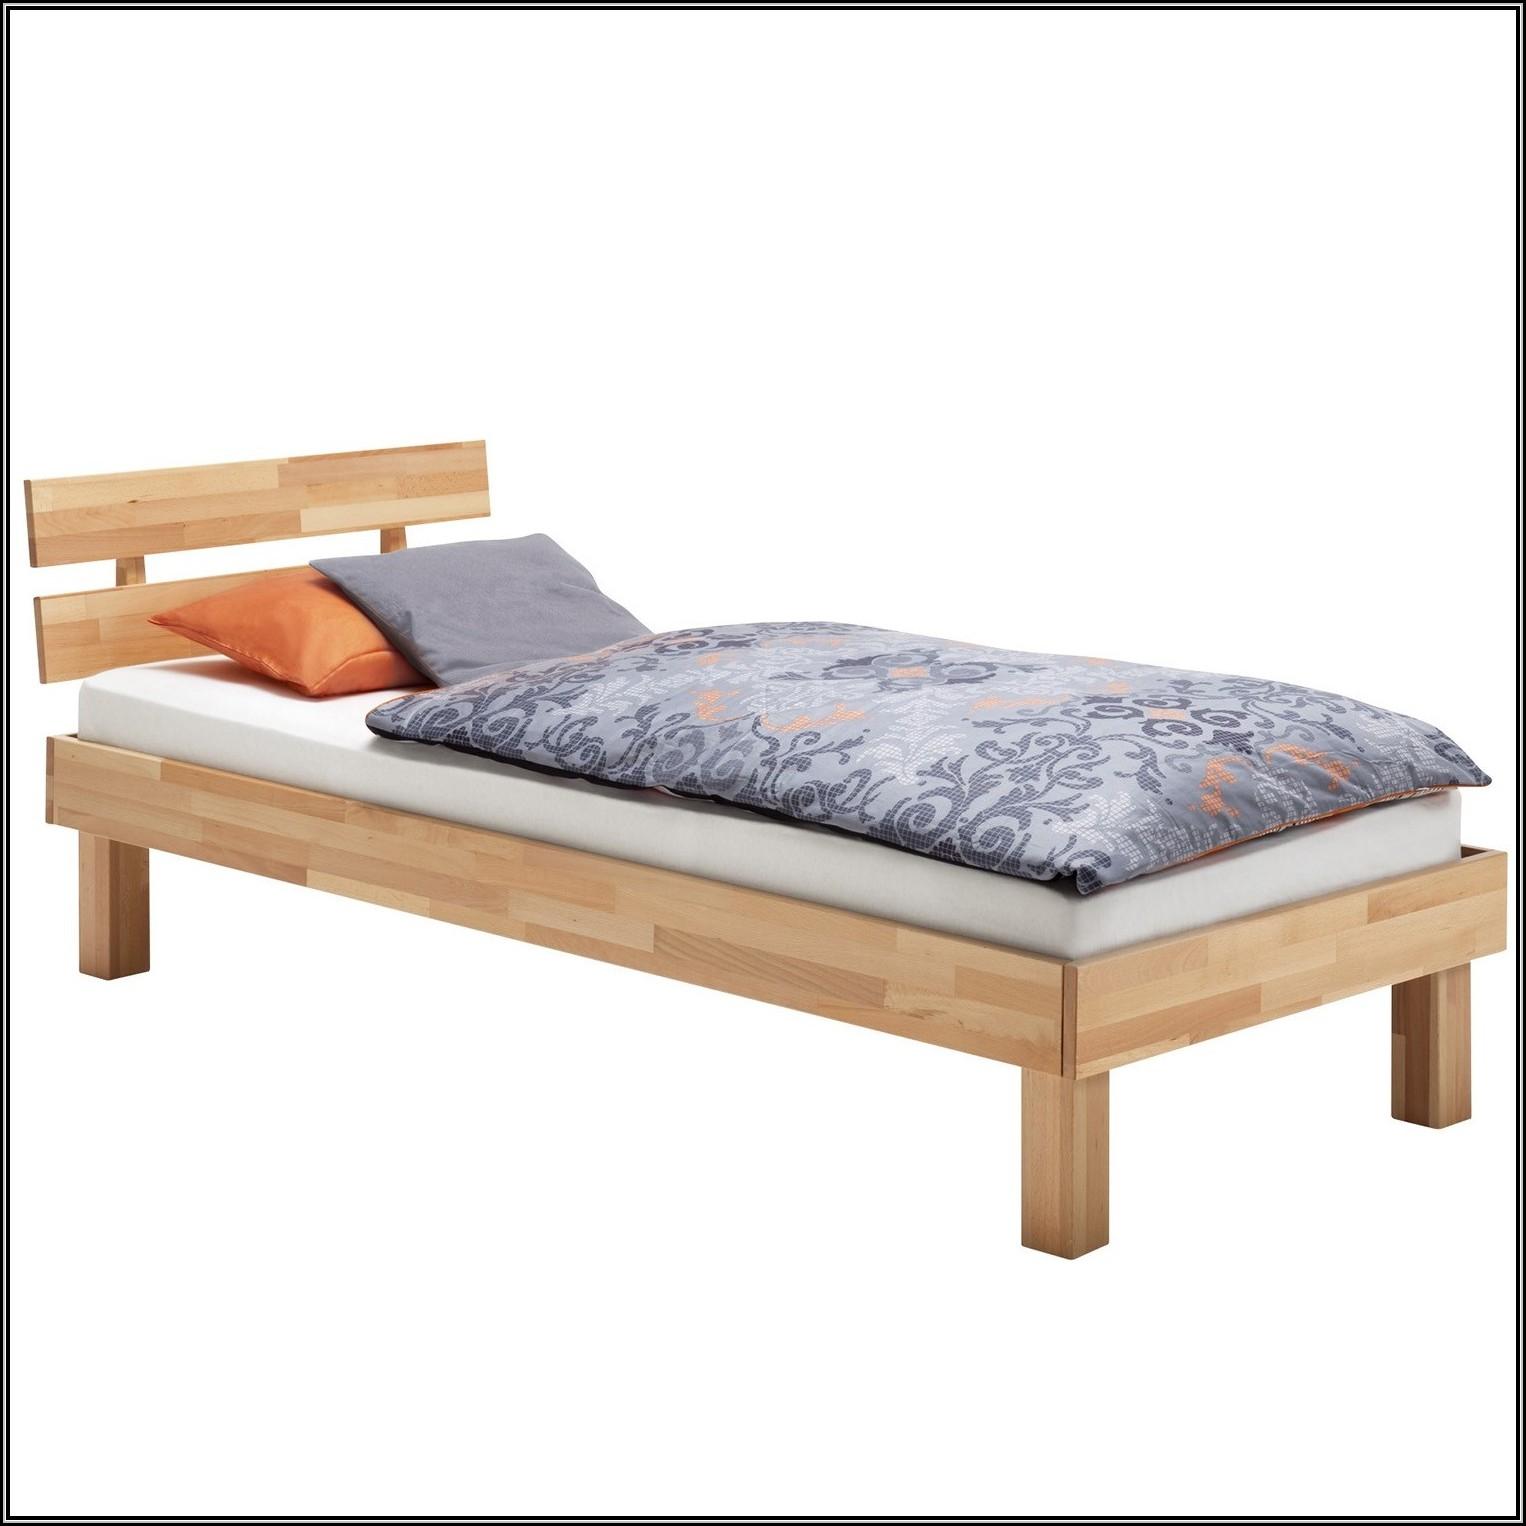 bett buche nachbildung 90x200 betten house und dekor galerie 0a1nnmb1qg. Black Bedroom Furniture Sets. Home Design Ideas